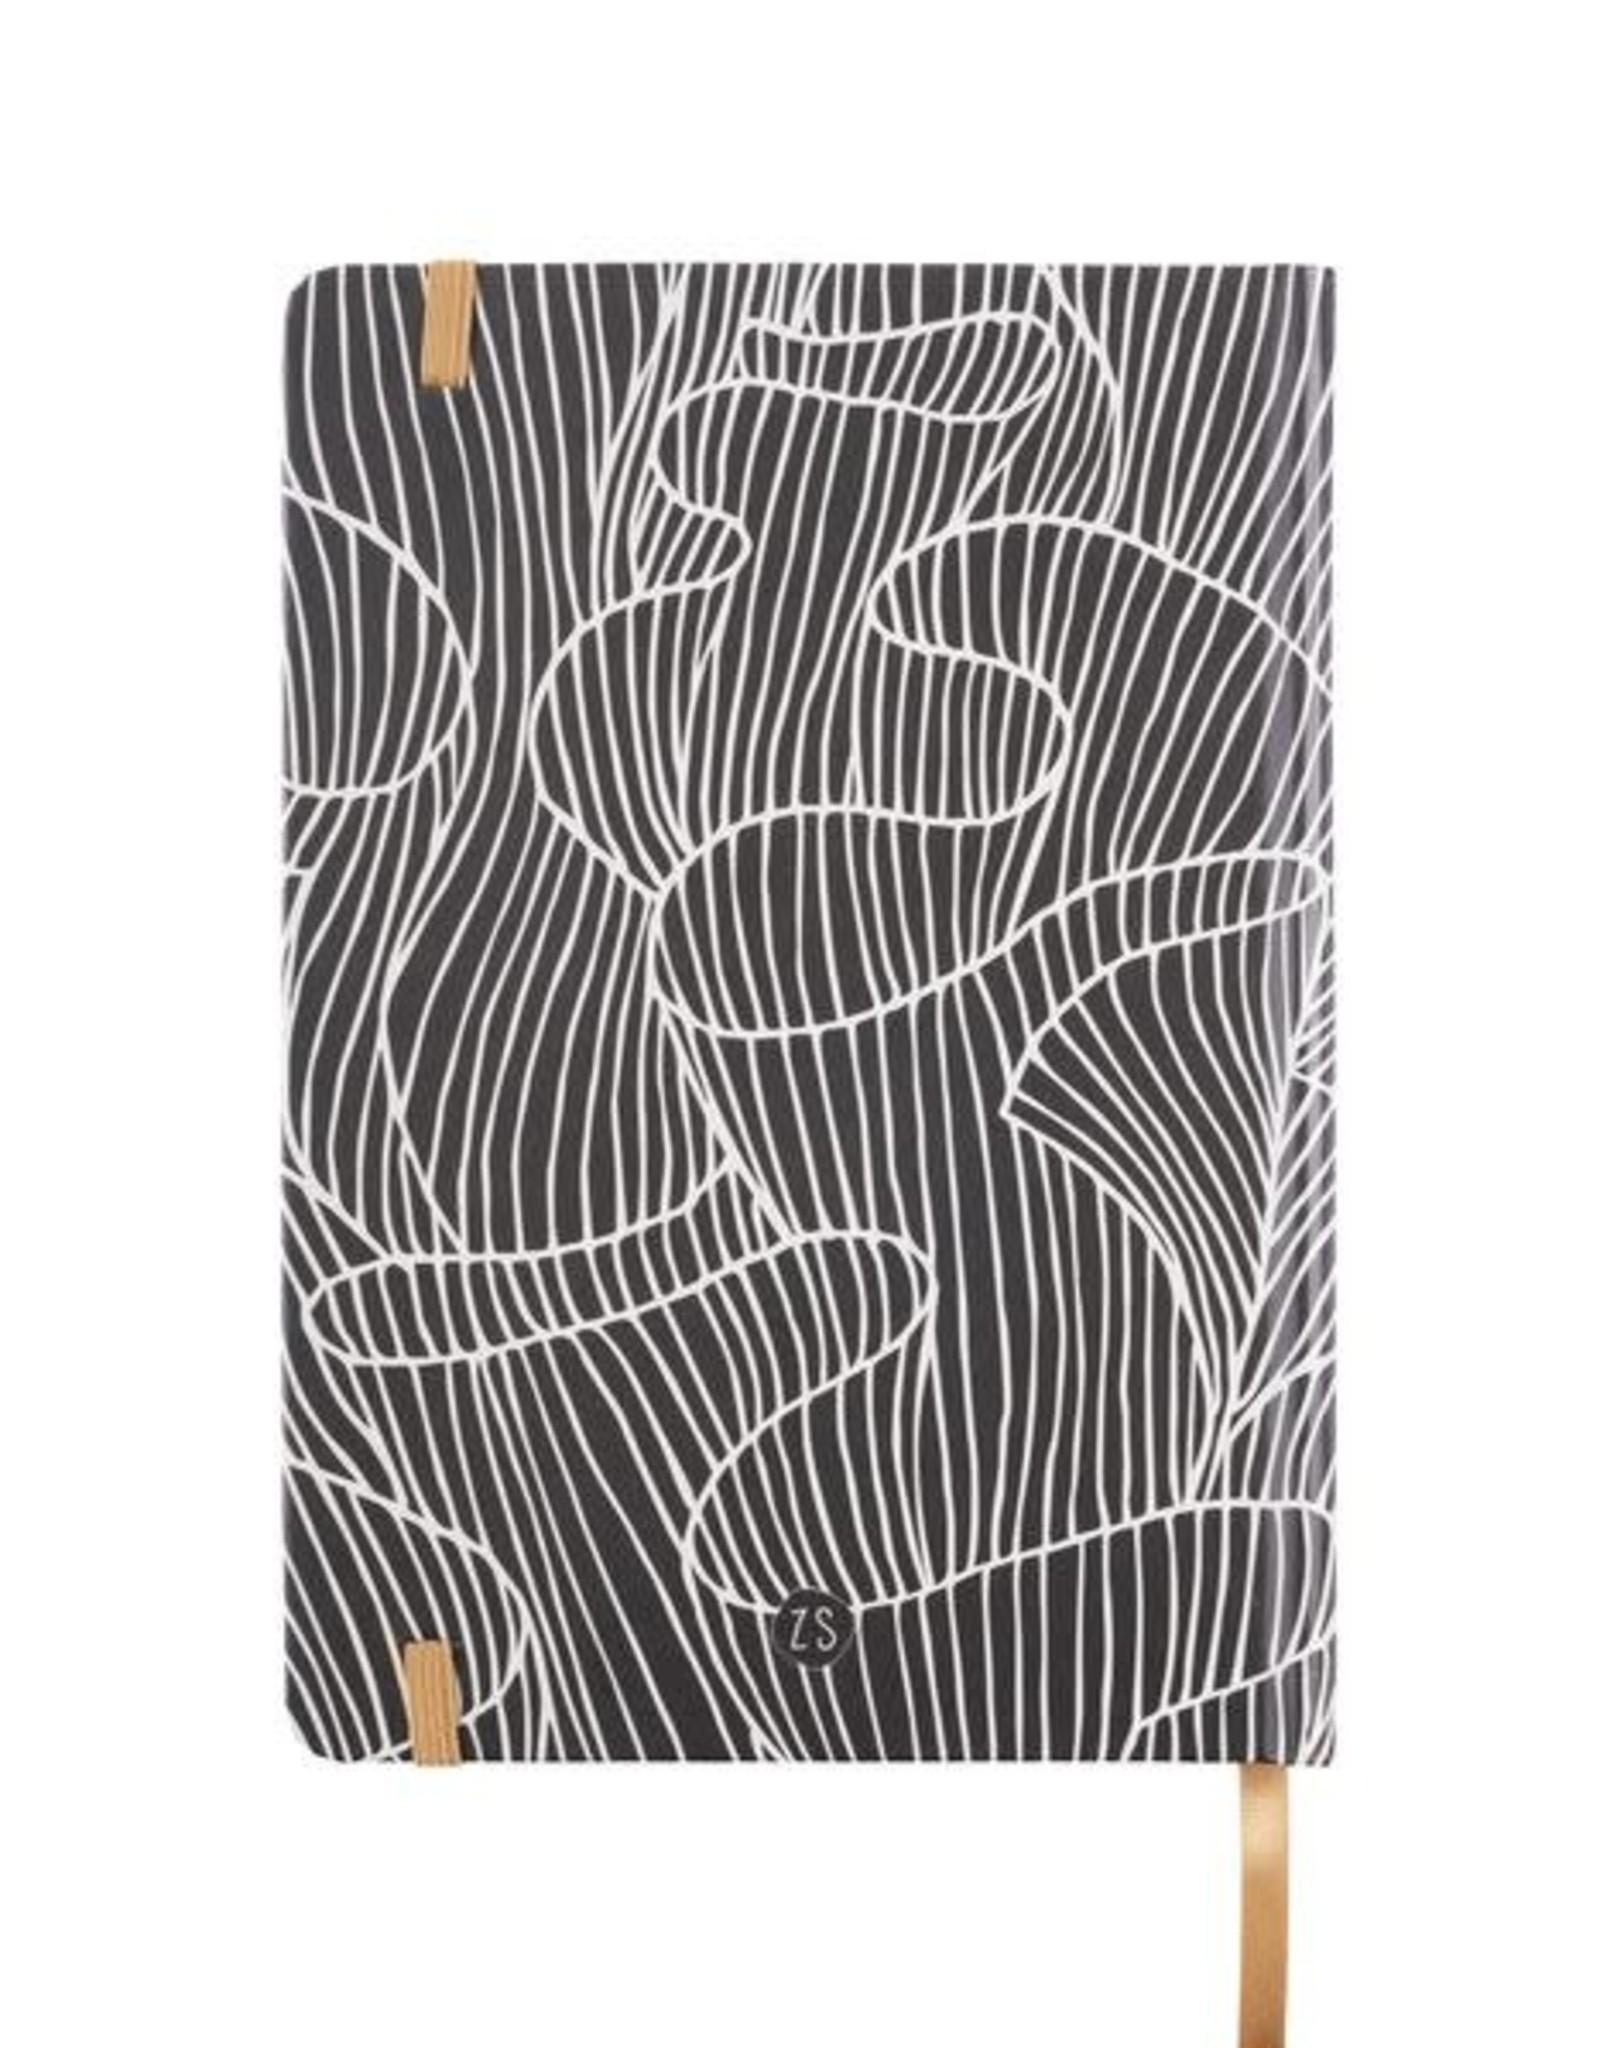 Zusss Zusss - Notitieboek koraalrif print zand